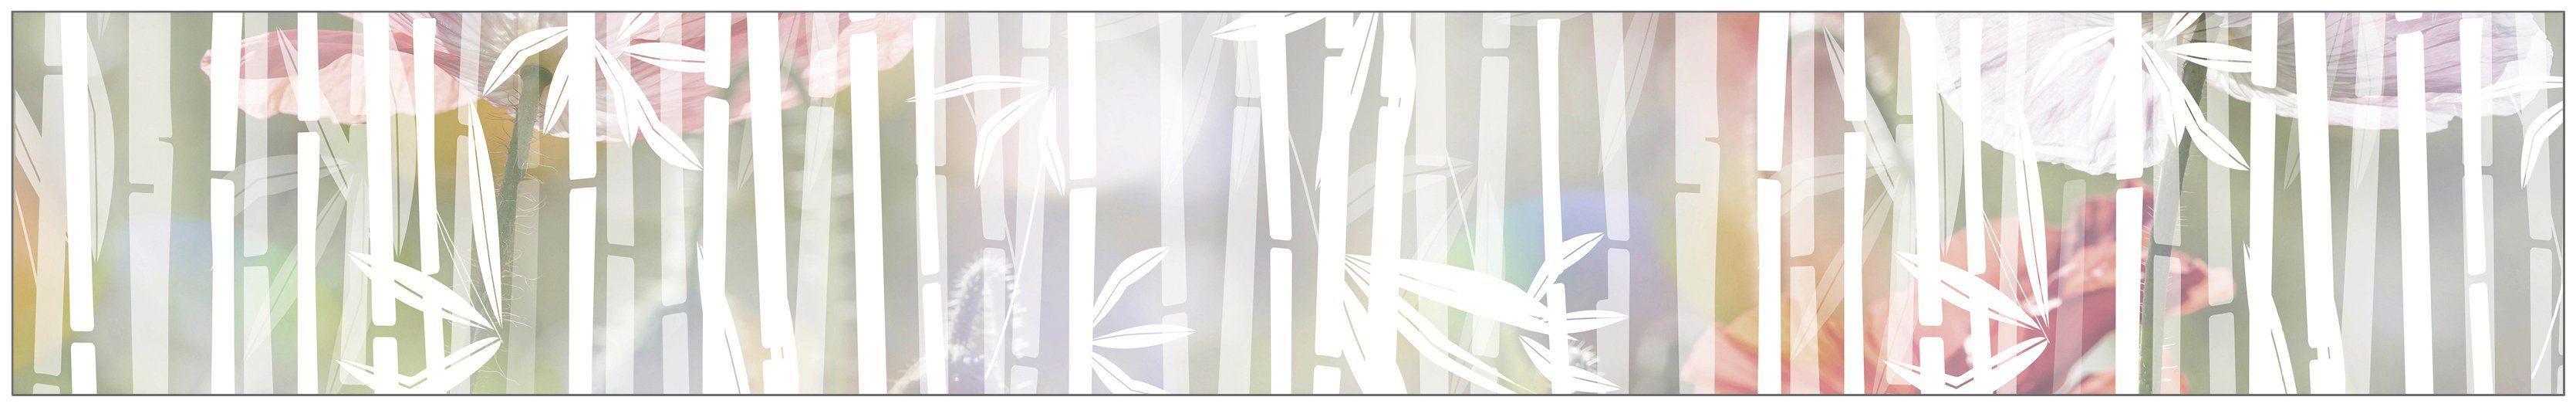 MYSPOTTI Fensterfolie »mySPOTTI look Bamboo white«, 200 x 30 cm, statisch haftend